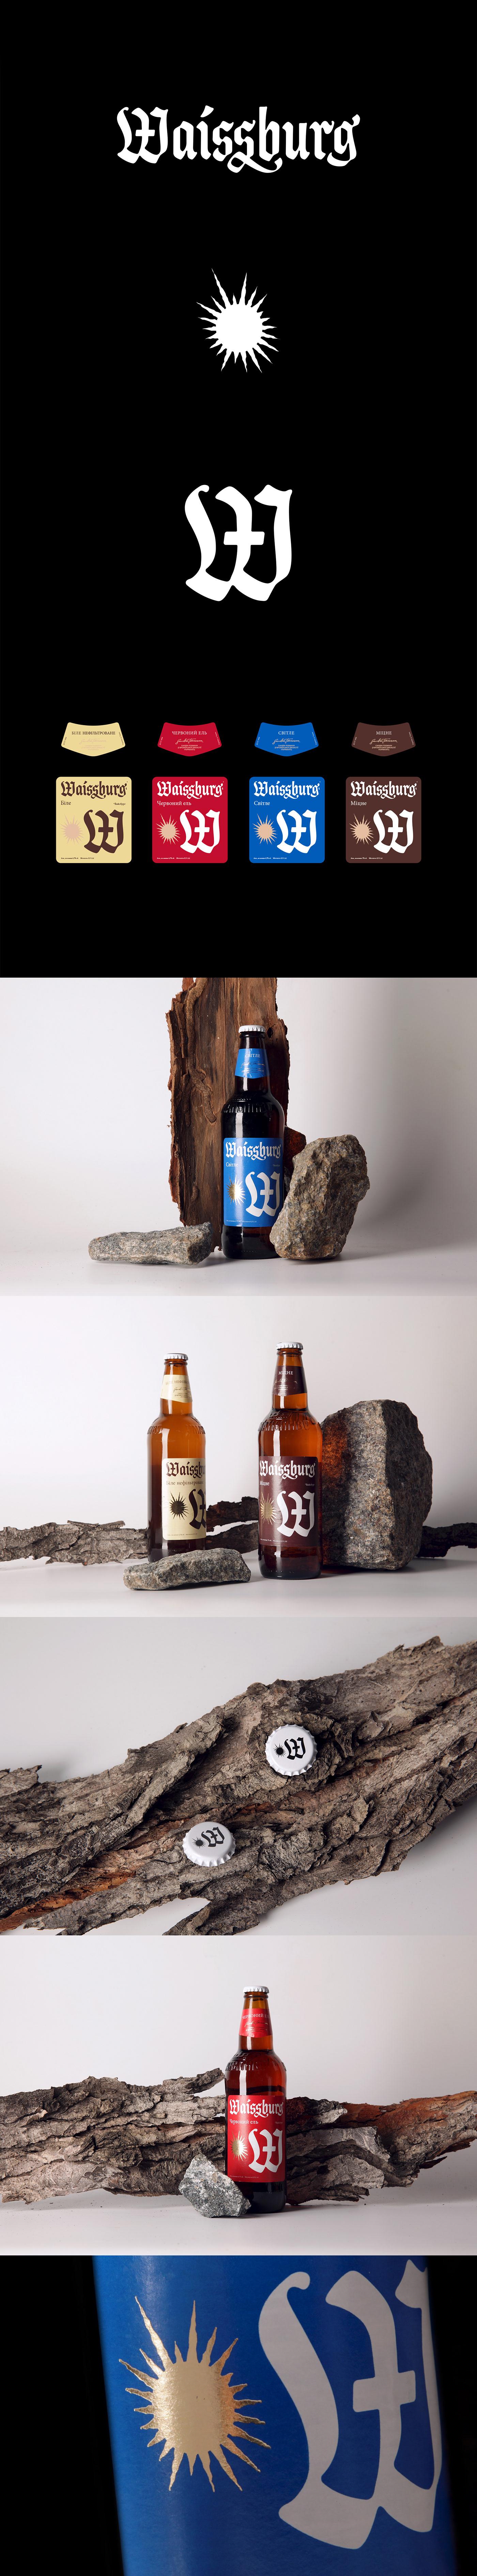 beer gothic foilstamp waissburg ukraine Kyiv package Packaging branding  german